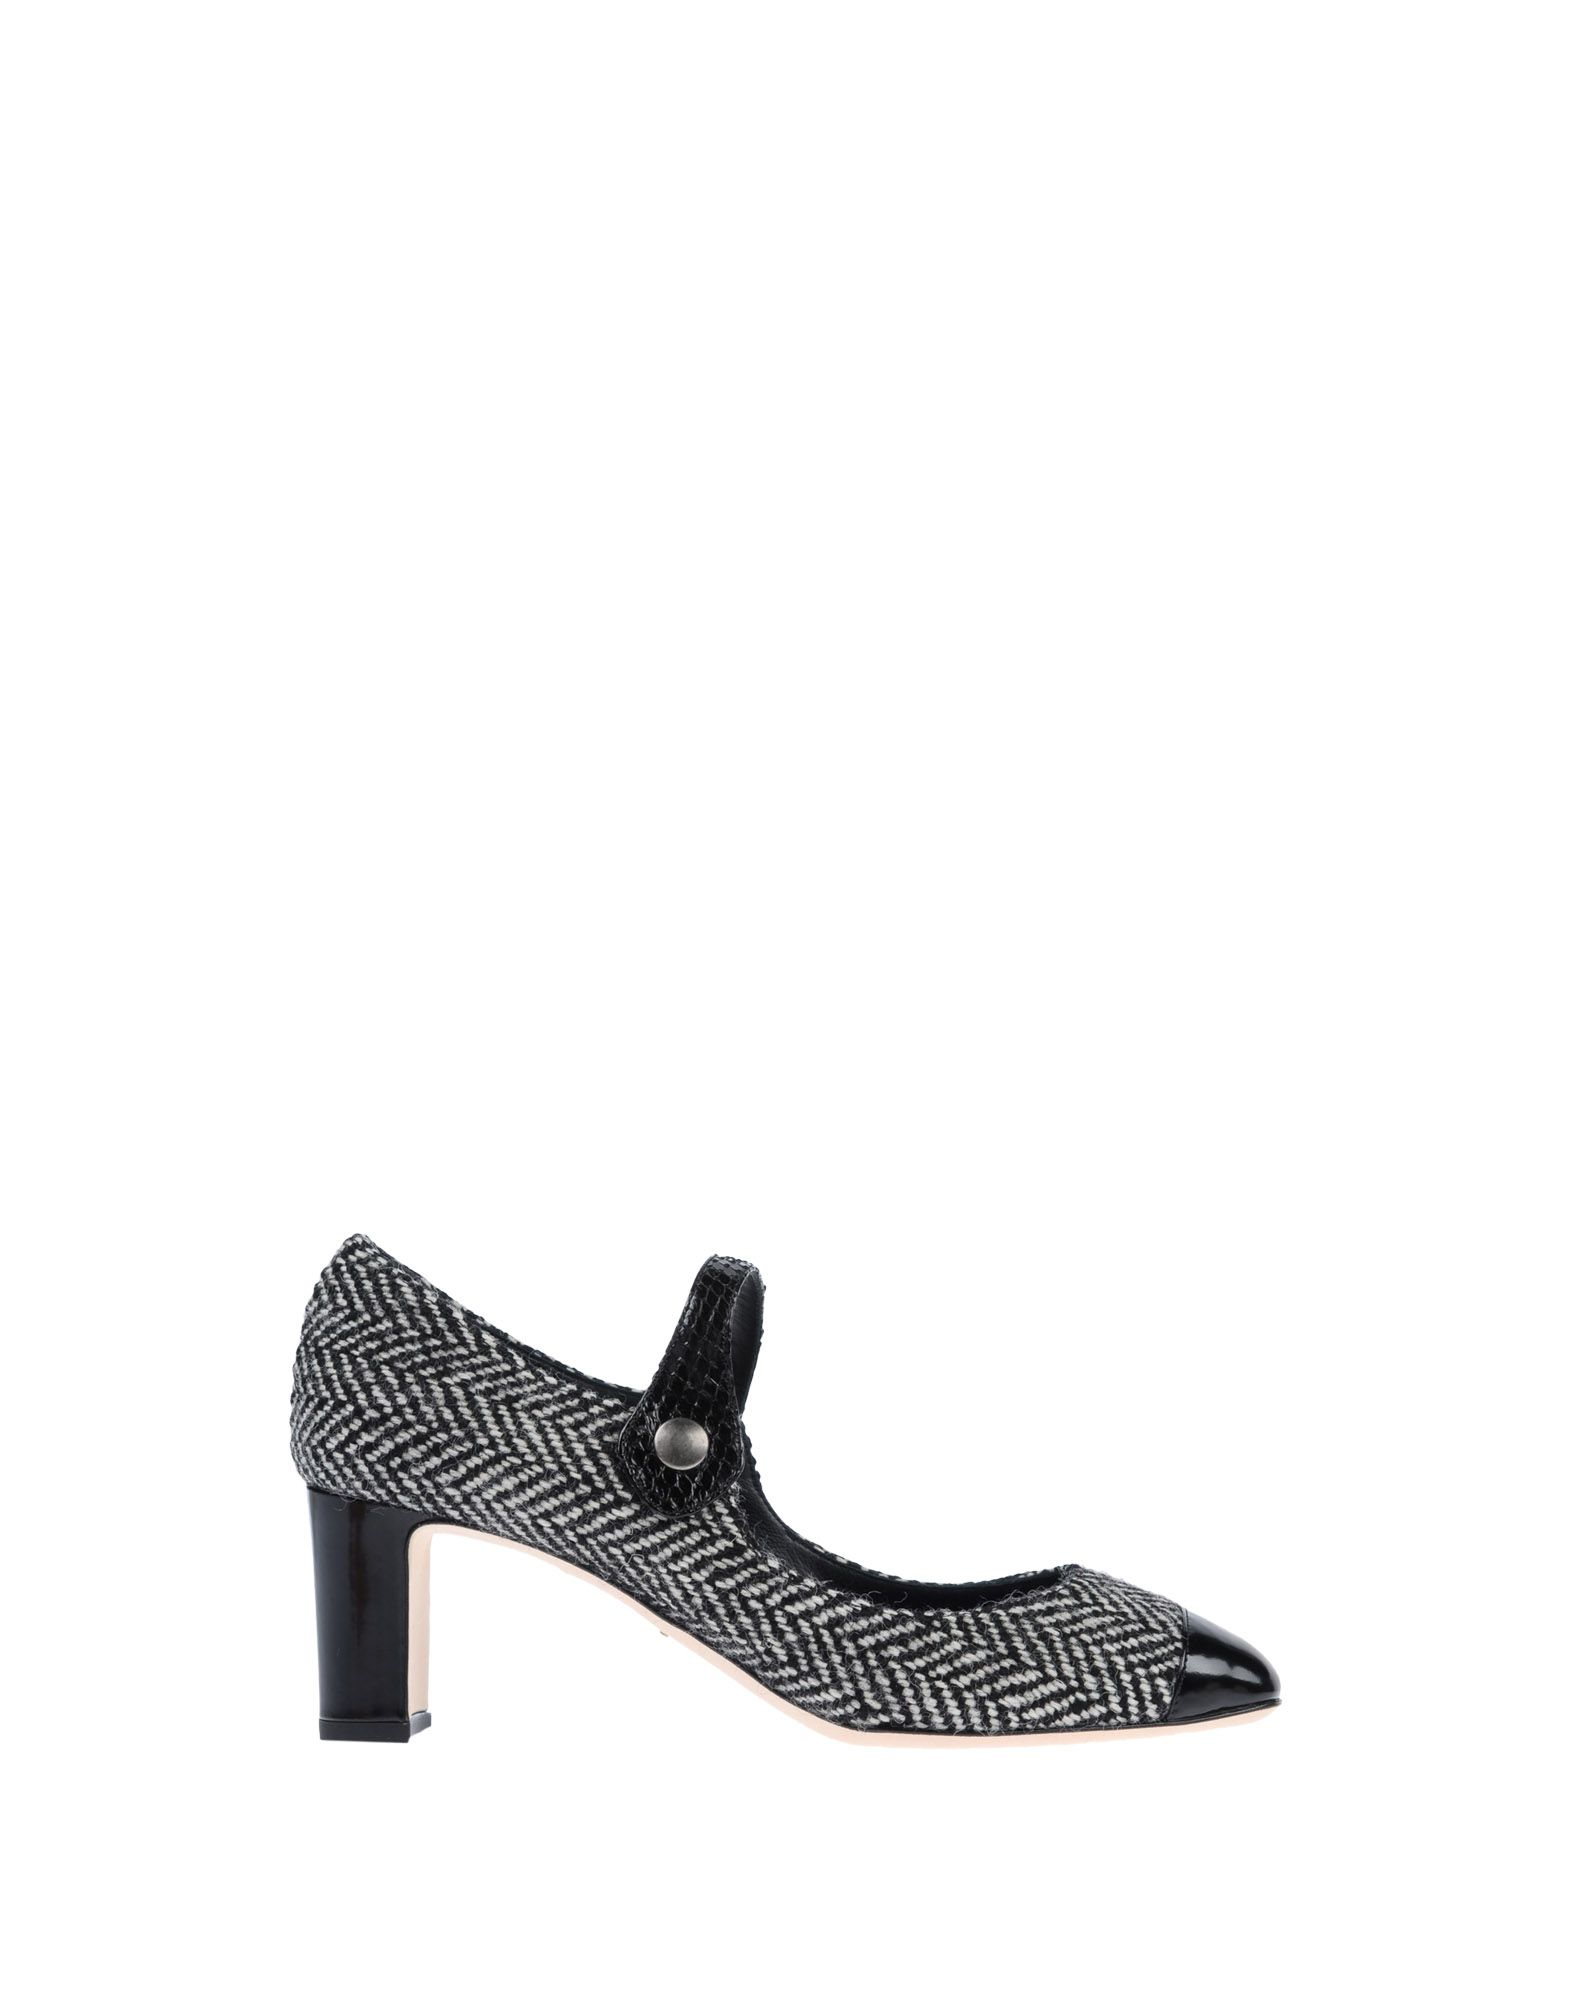 Dolce & Gabbana Pumps Damen Schuhe  11488606QKGünstige gut aussehende Schuhe Damen 987ed9